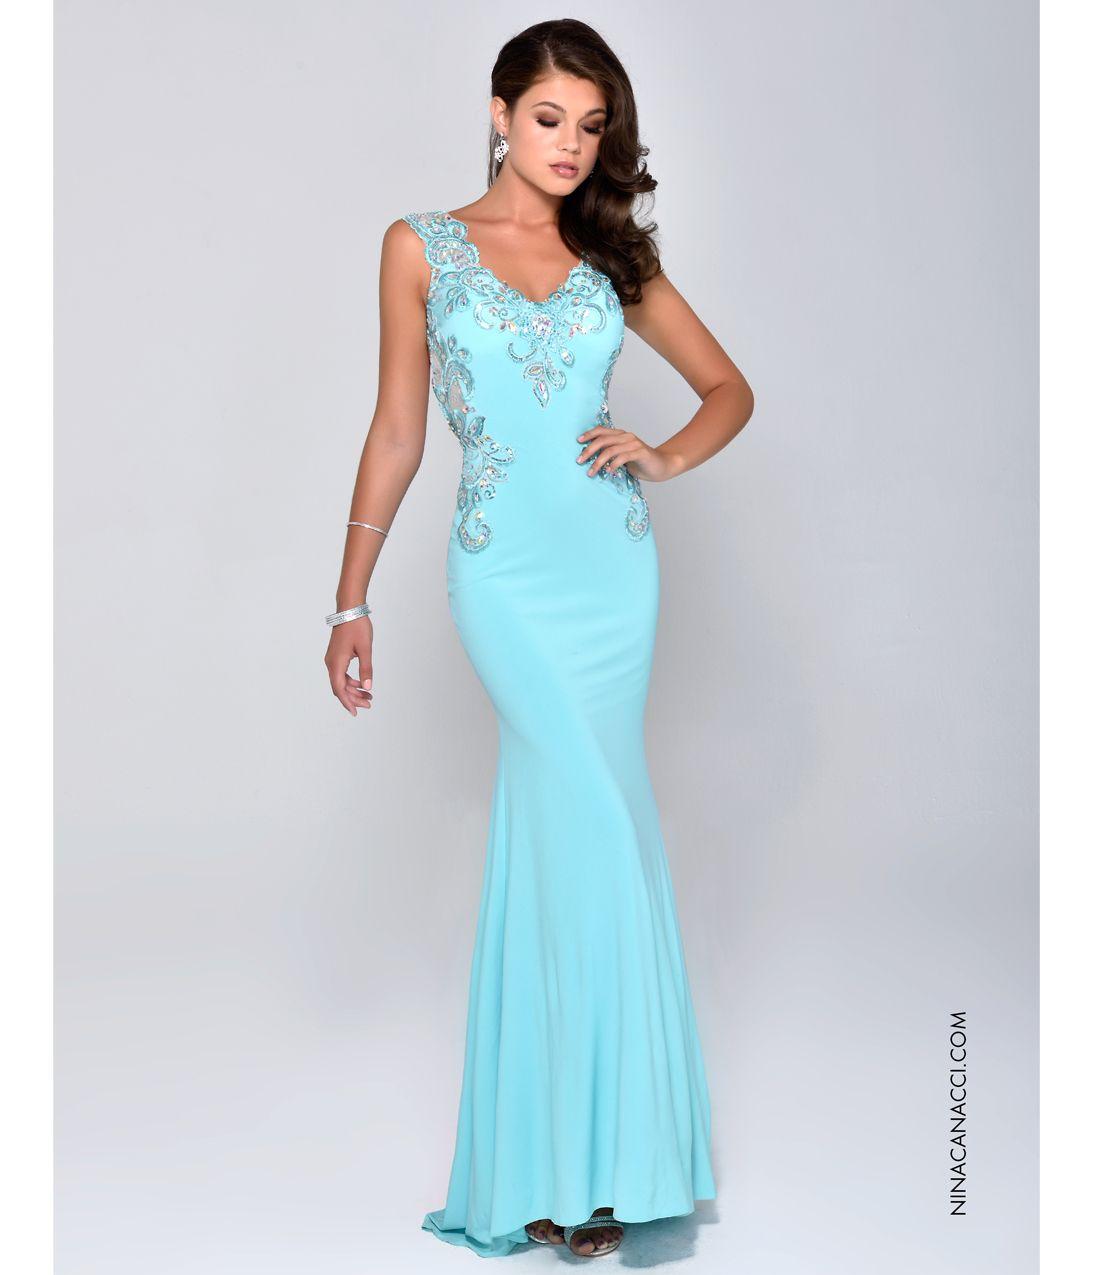 100 + Great Gatsby Prom Dresses for Sale | Aqua blue dress, Prom ...